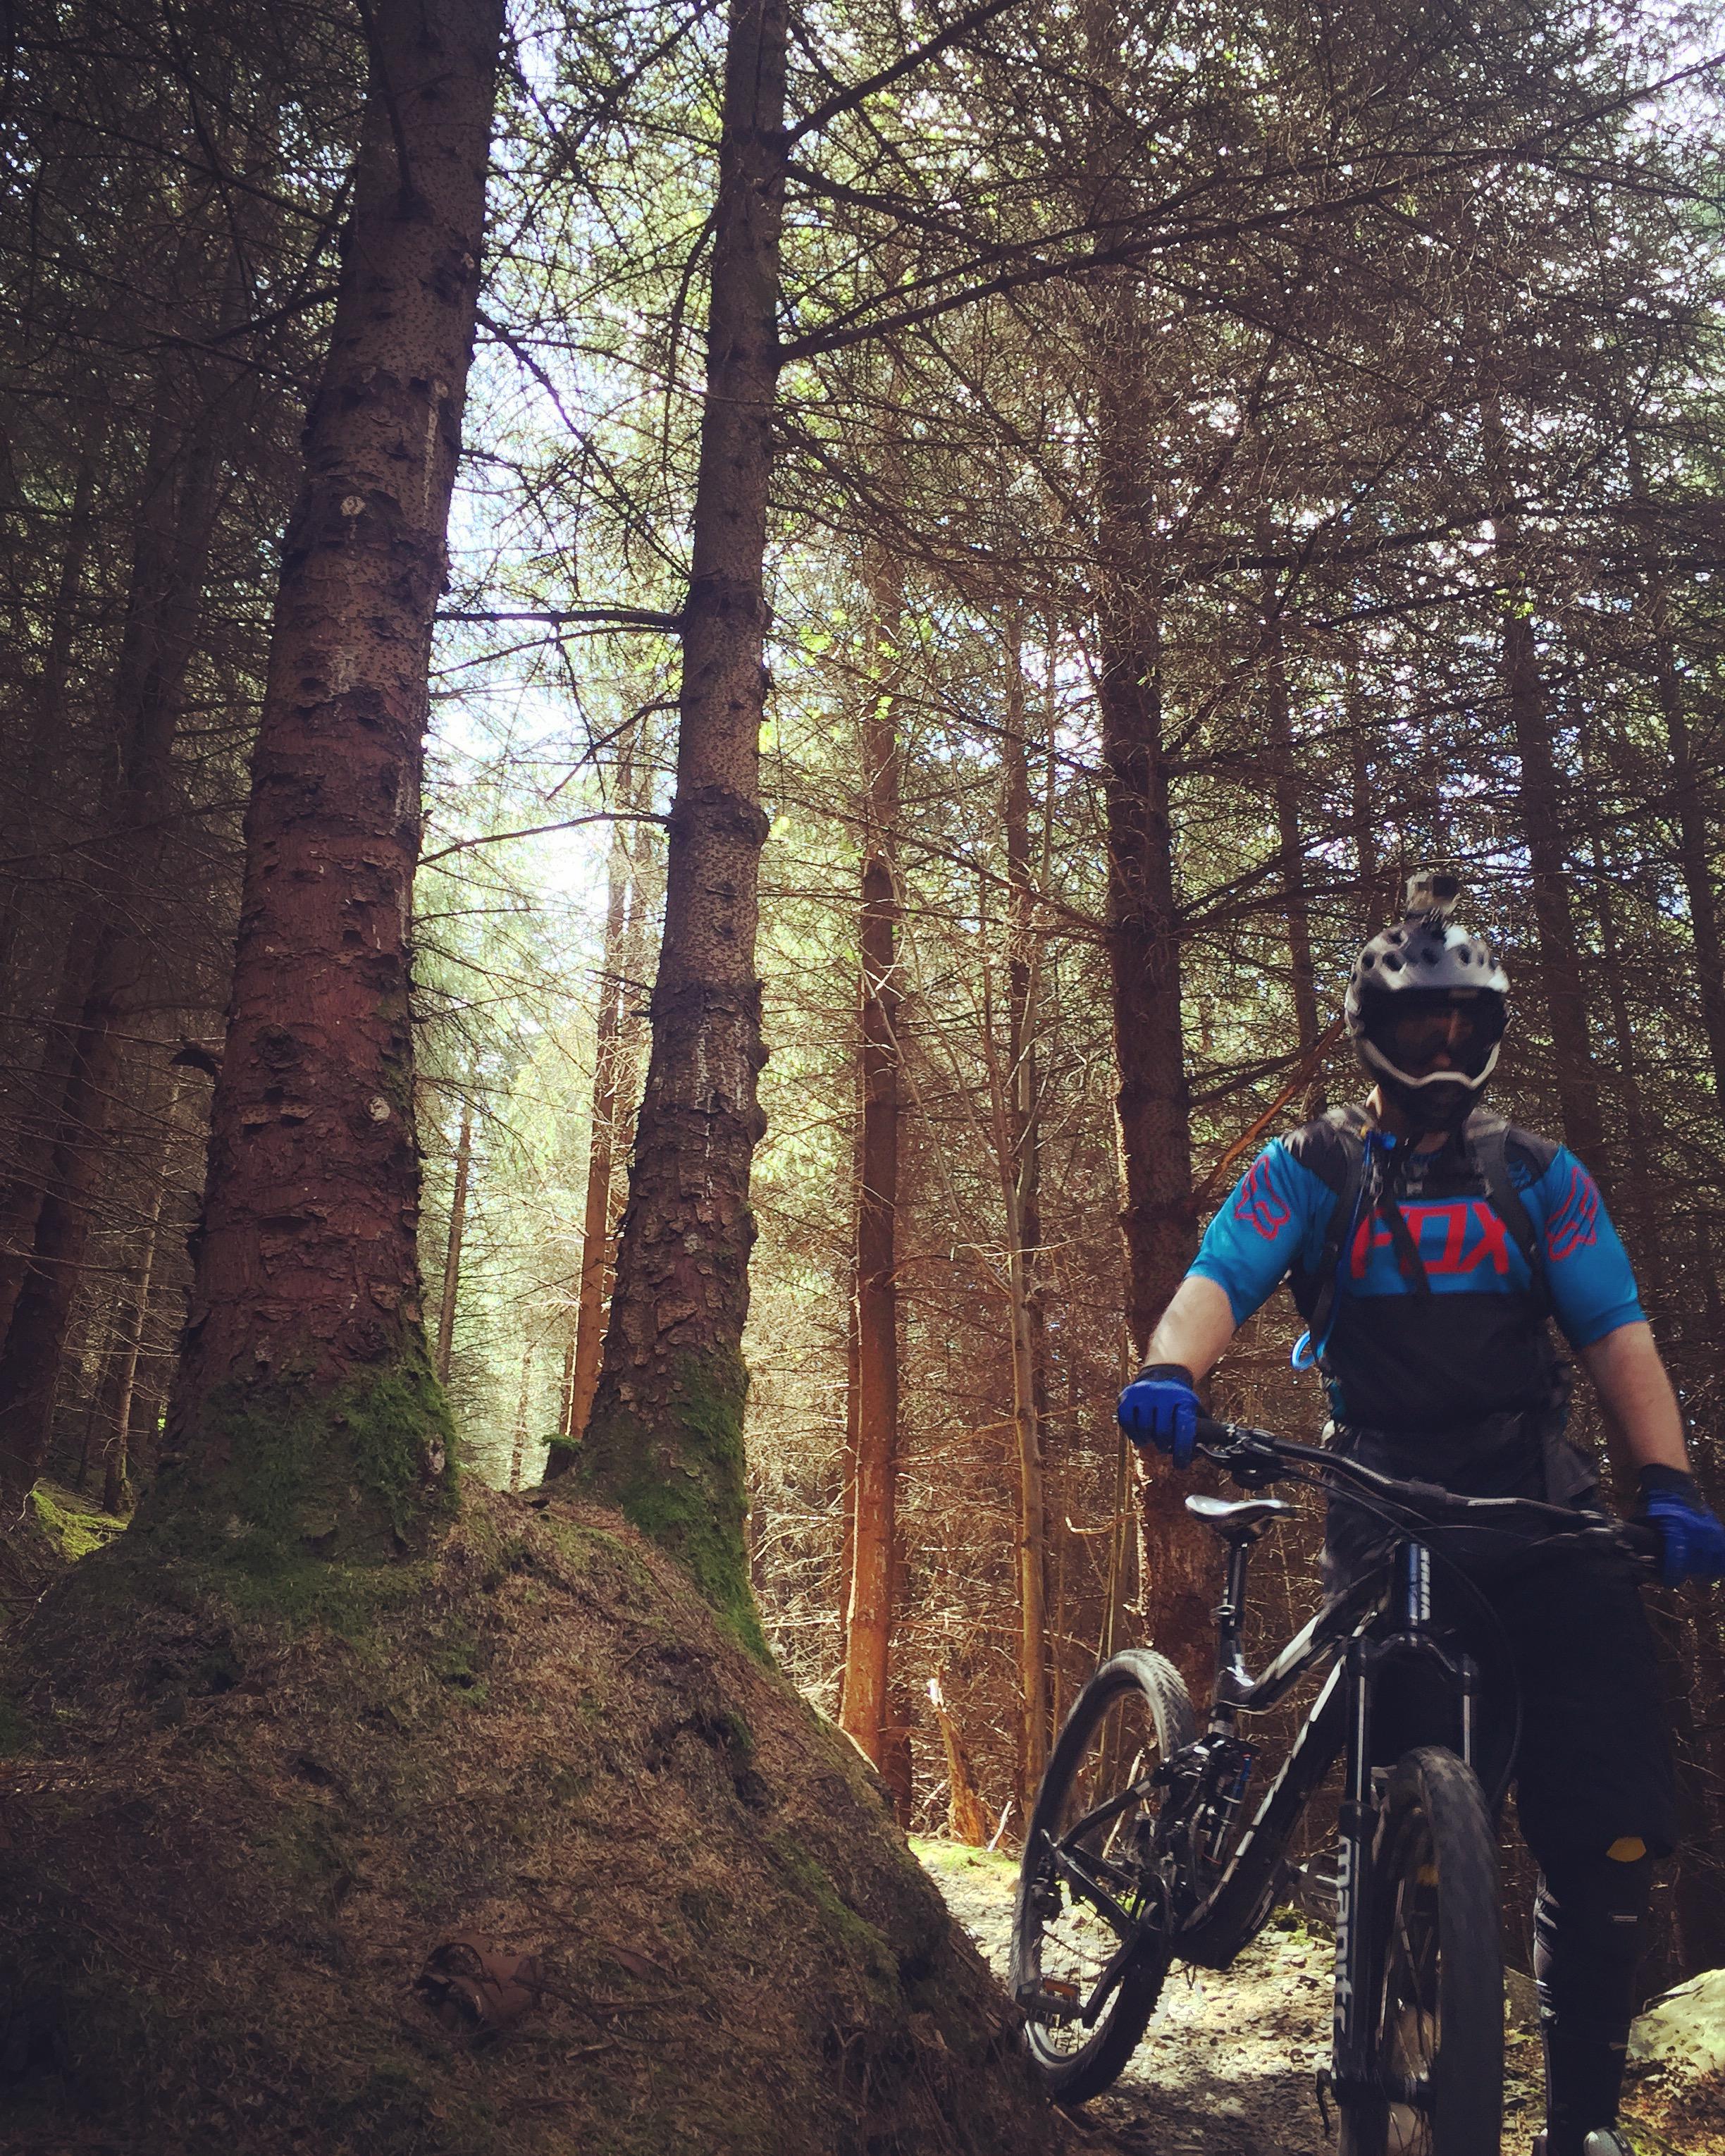 silhouettes_trees_kilbroney_forest_trails_rostrevor_mtb_mountainbiking_ni_explorer_niexplorer_northern_ireland_blog.jpg